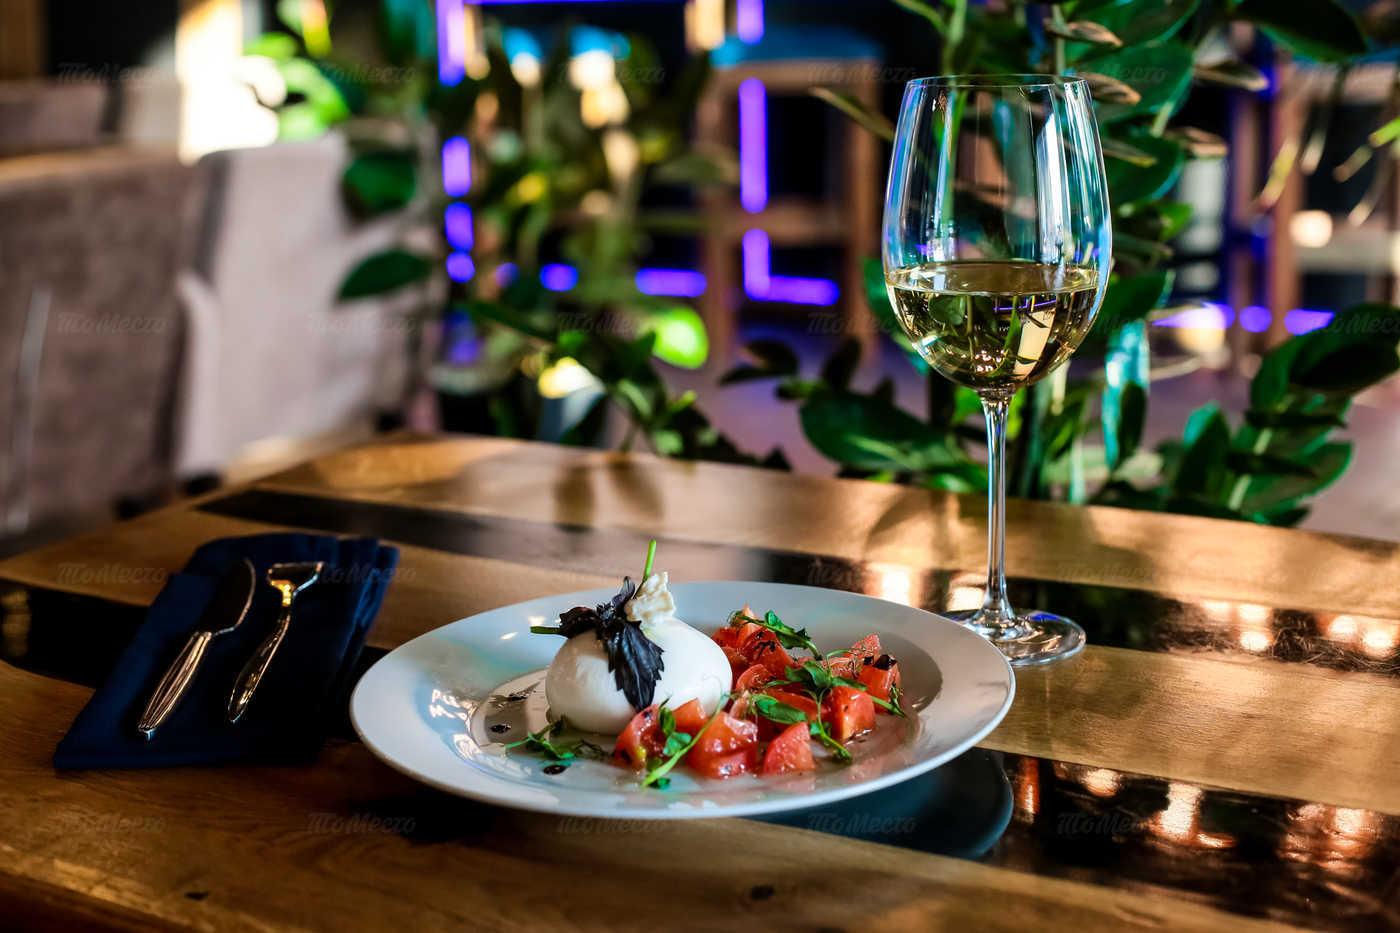 Меню ресторана Puerto Madero (Пуэрто Мадеро) на Ходынском бульваре фото 10